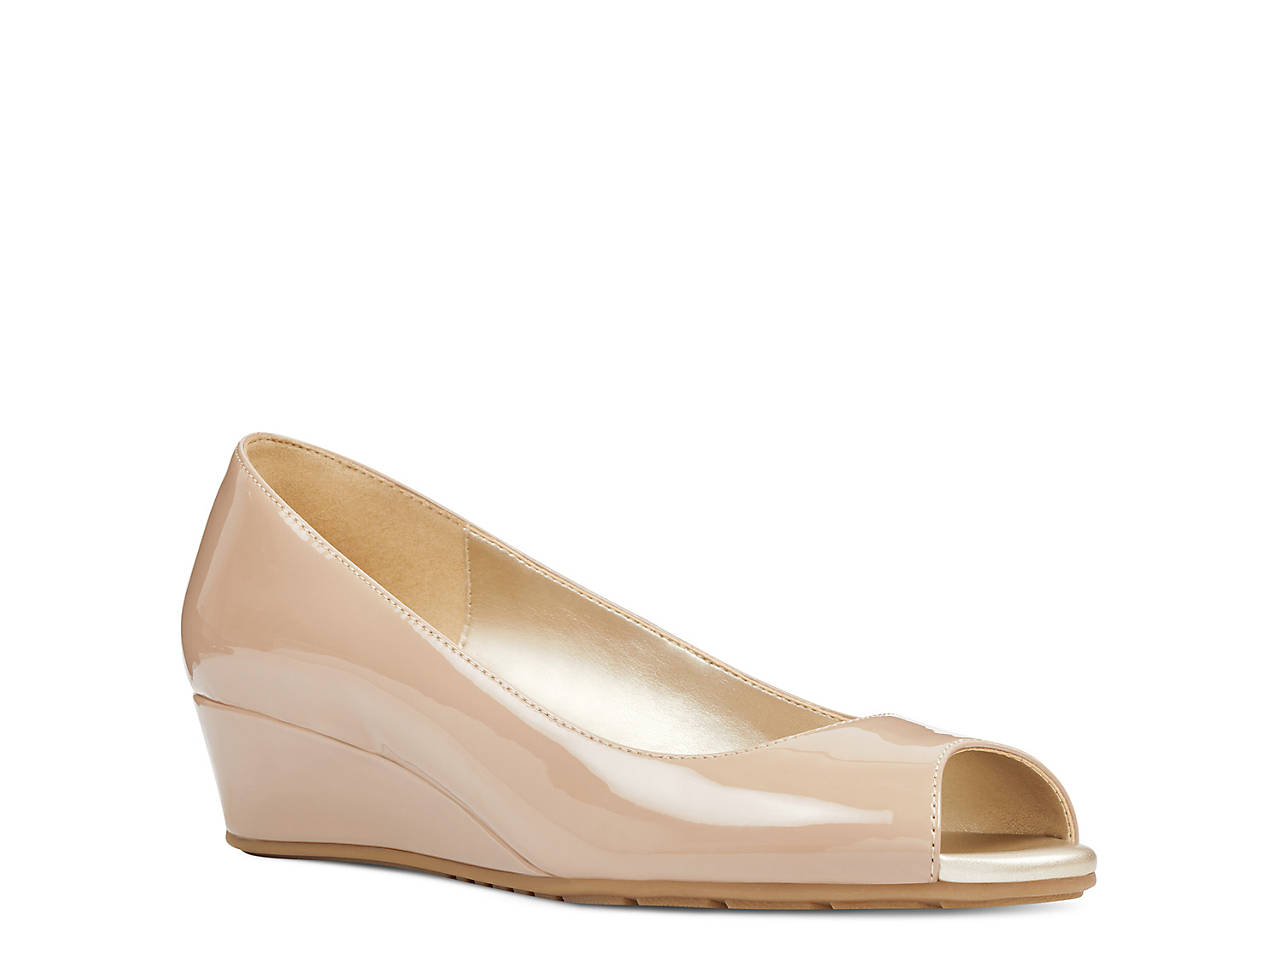 a47316b8478 Bandolino Candra Wedge Pump Men s Shoes